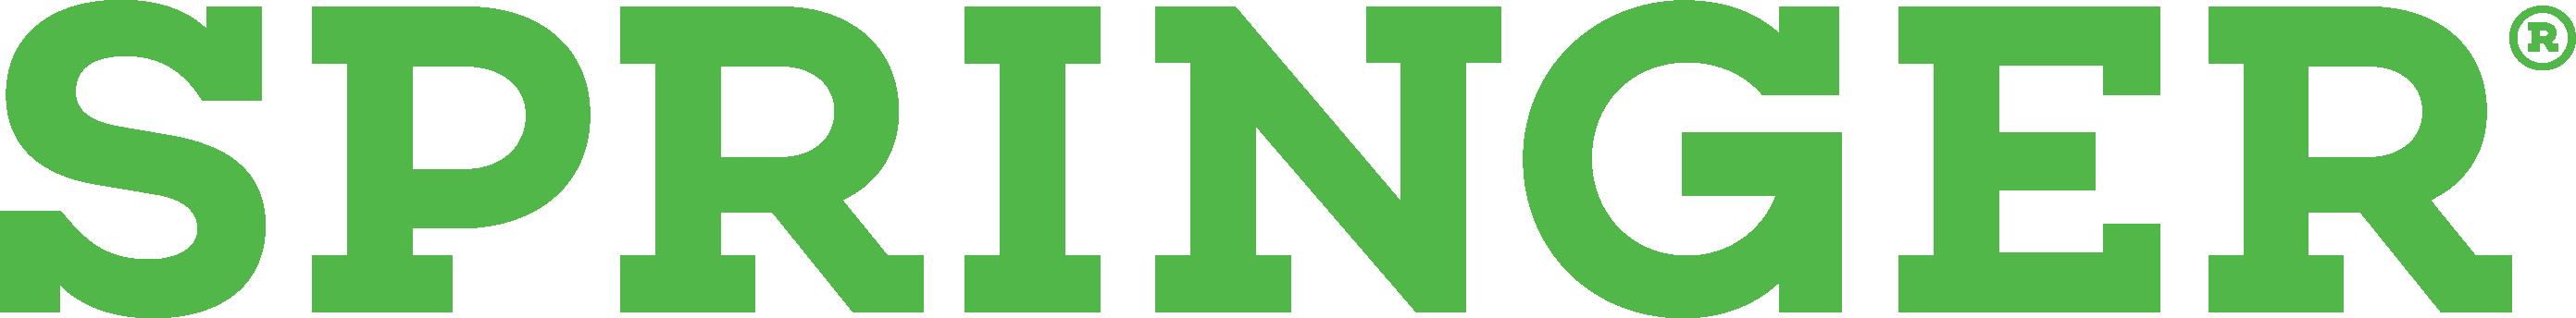 SPRINGER Maschinenfabrik GmbH Logo